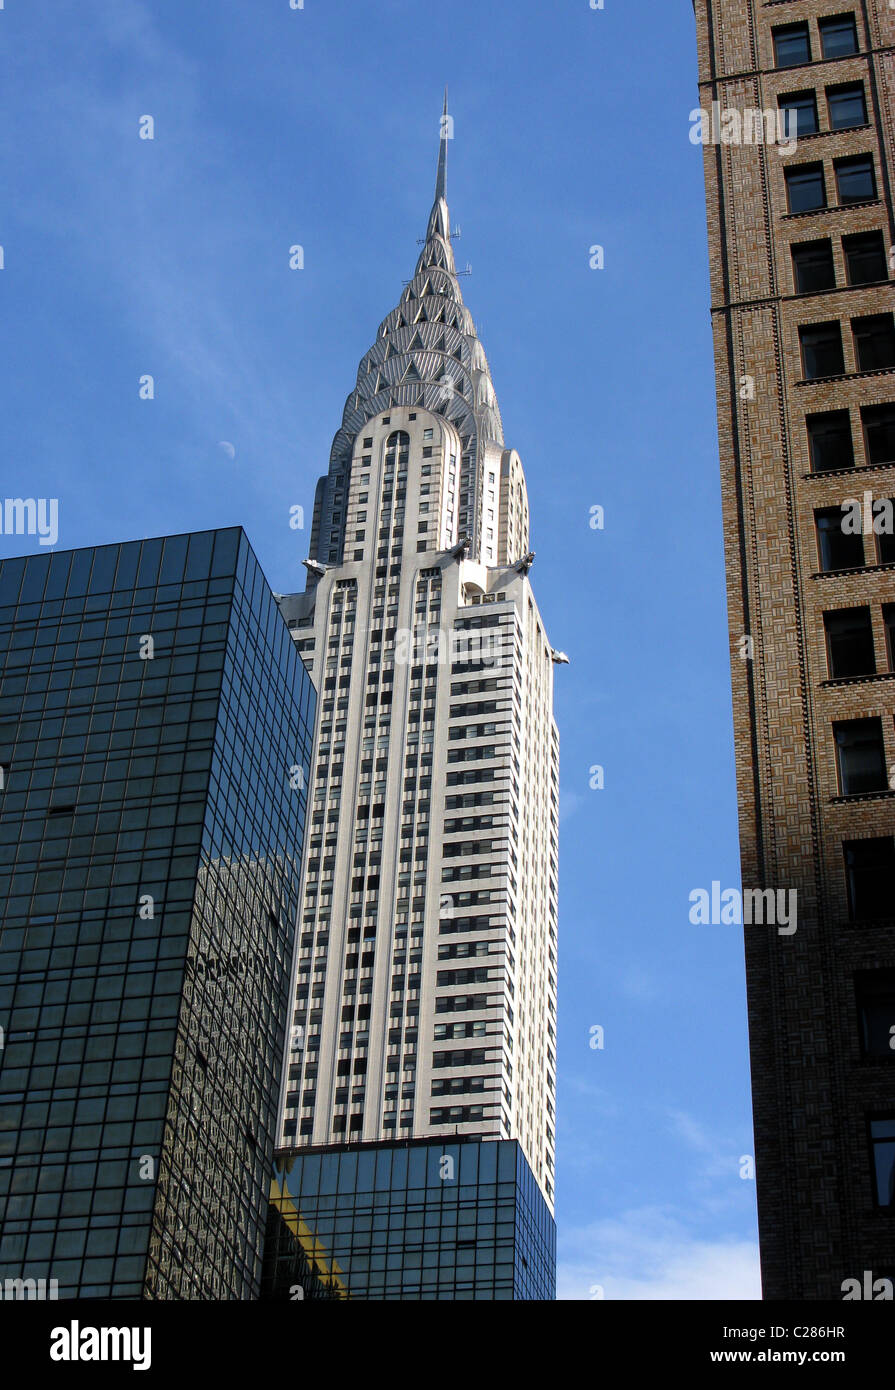 Chrysler Building, New York City Chrysler Building, USA - Stock Image